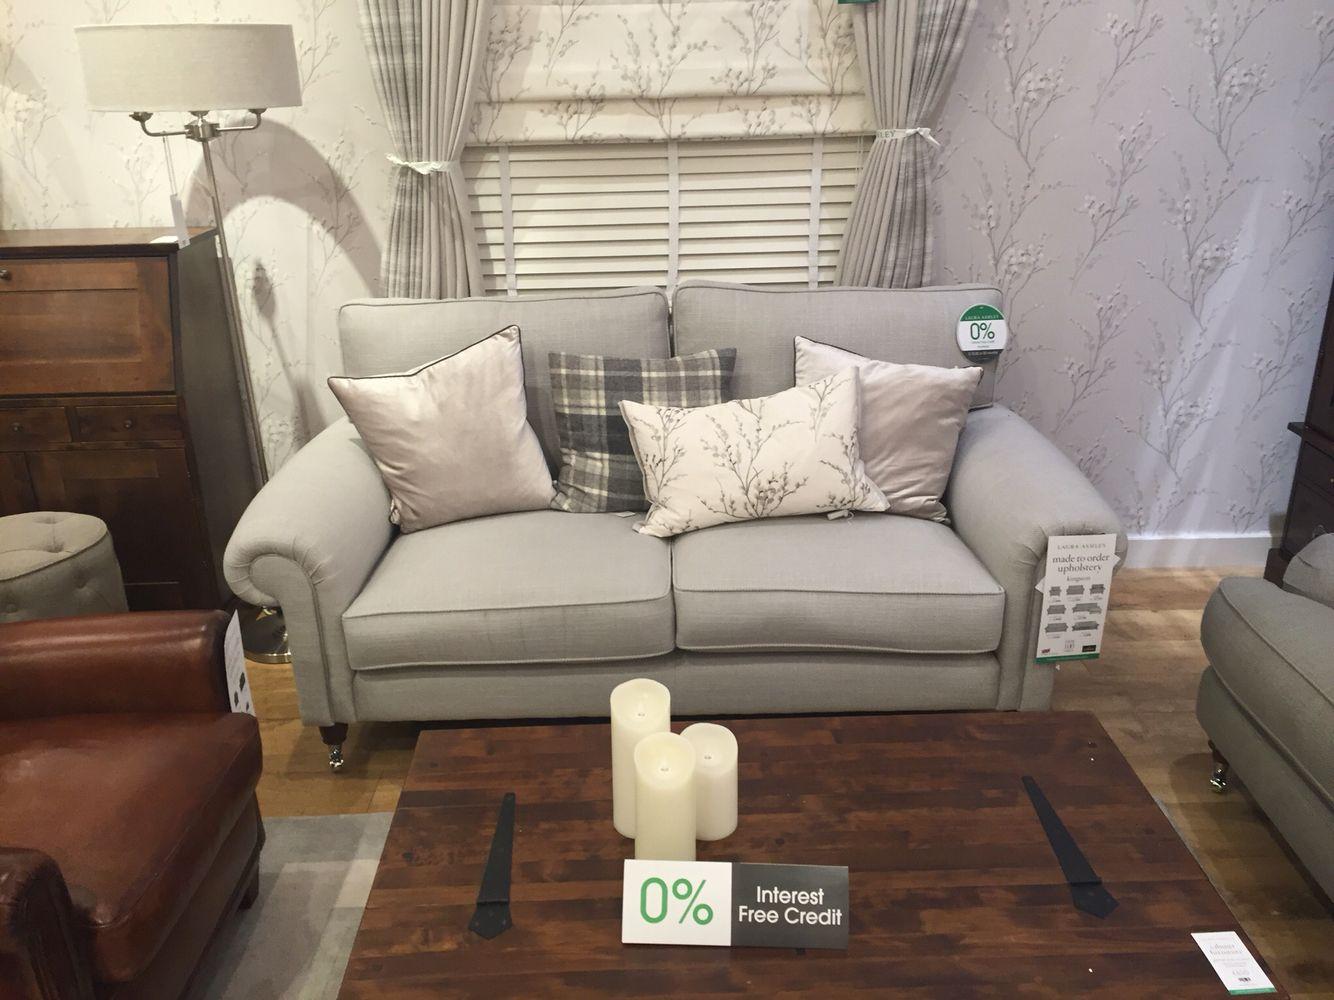 chair covers kingston big boy chairs uk laura ashley sofa dove grey home decor